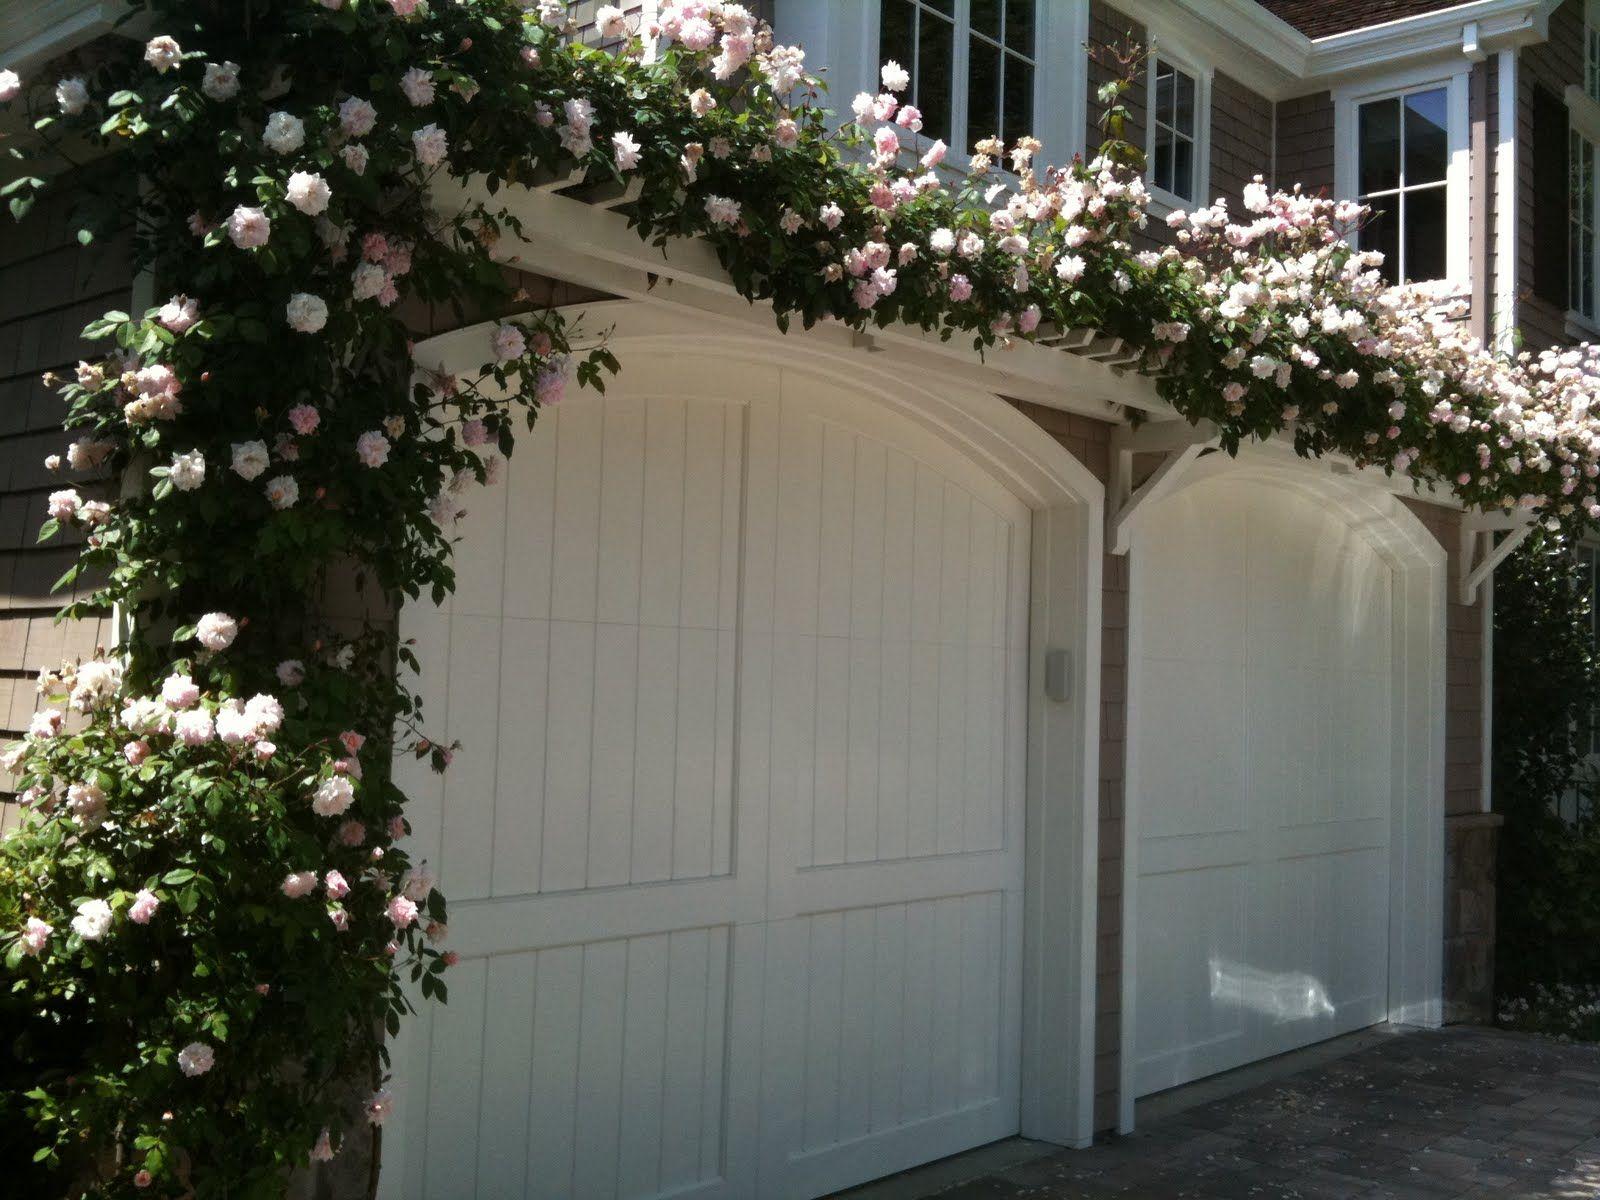 Trellis Above Garage Door Planted With Pink Climbing Roses